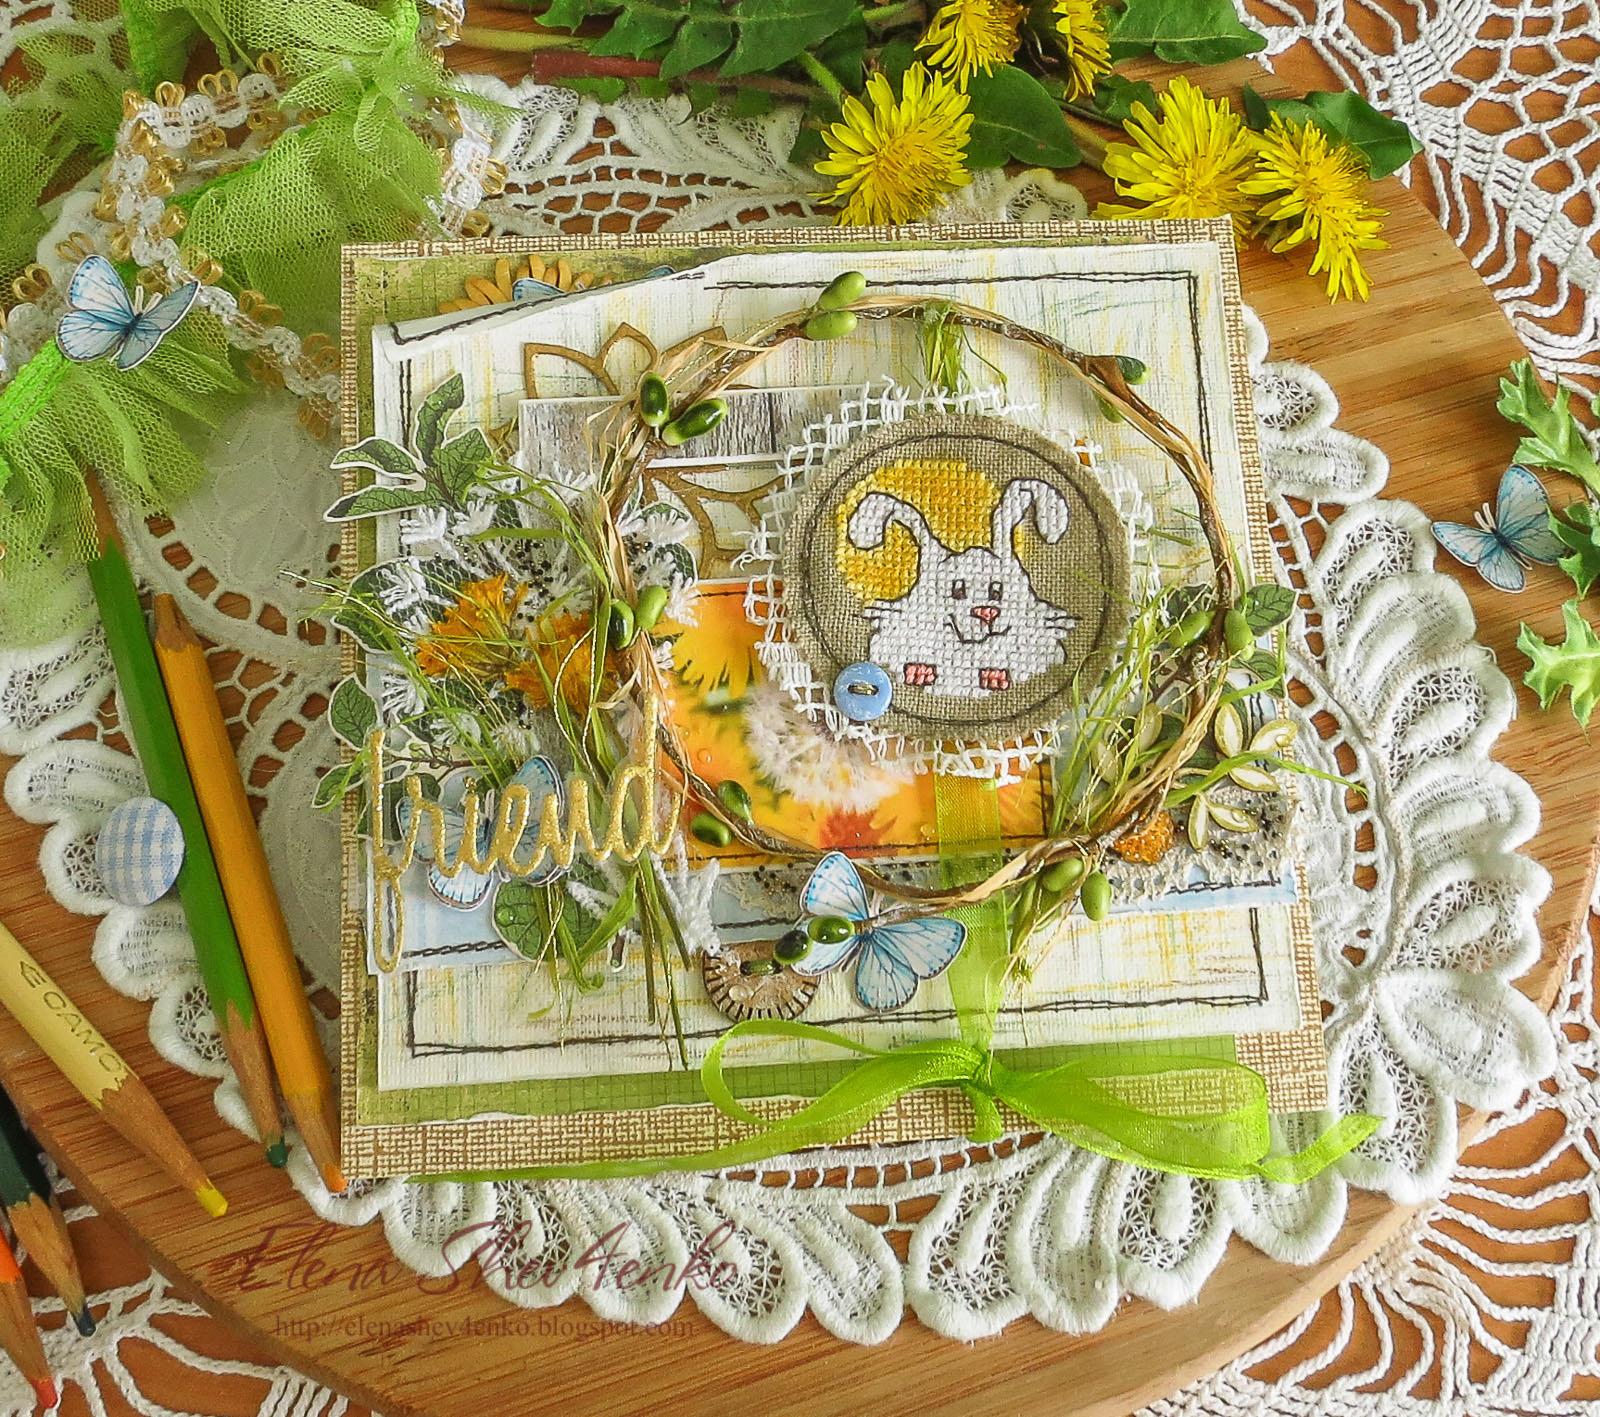 кульбабки, одуванчики, dandelions, cardmaking, spring postcard, открытка ручной работы, листівка ручної роботи, кардмейкинг, открытка с вышивкой, вышивка в скрапе, вишитий зайчик, embroidered hare